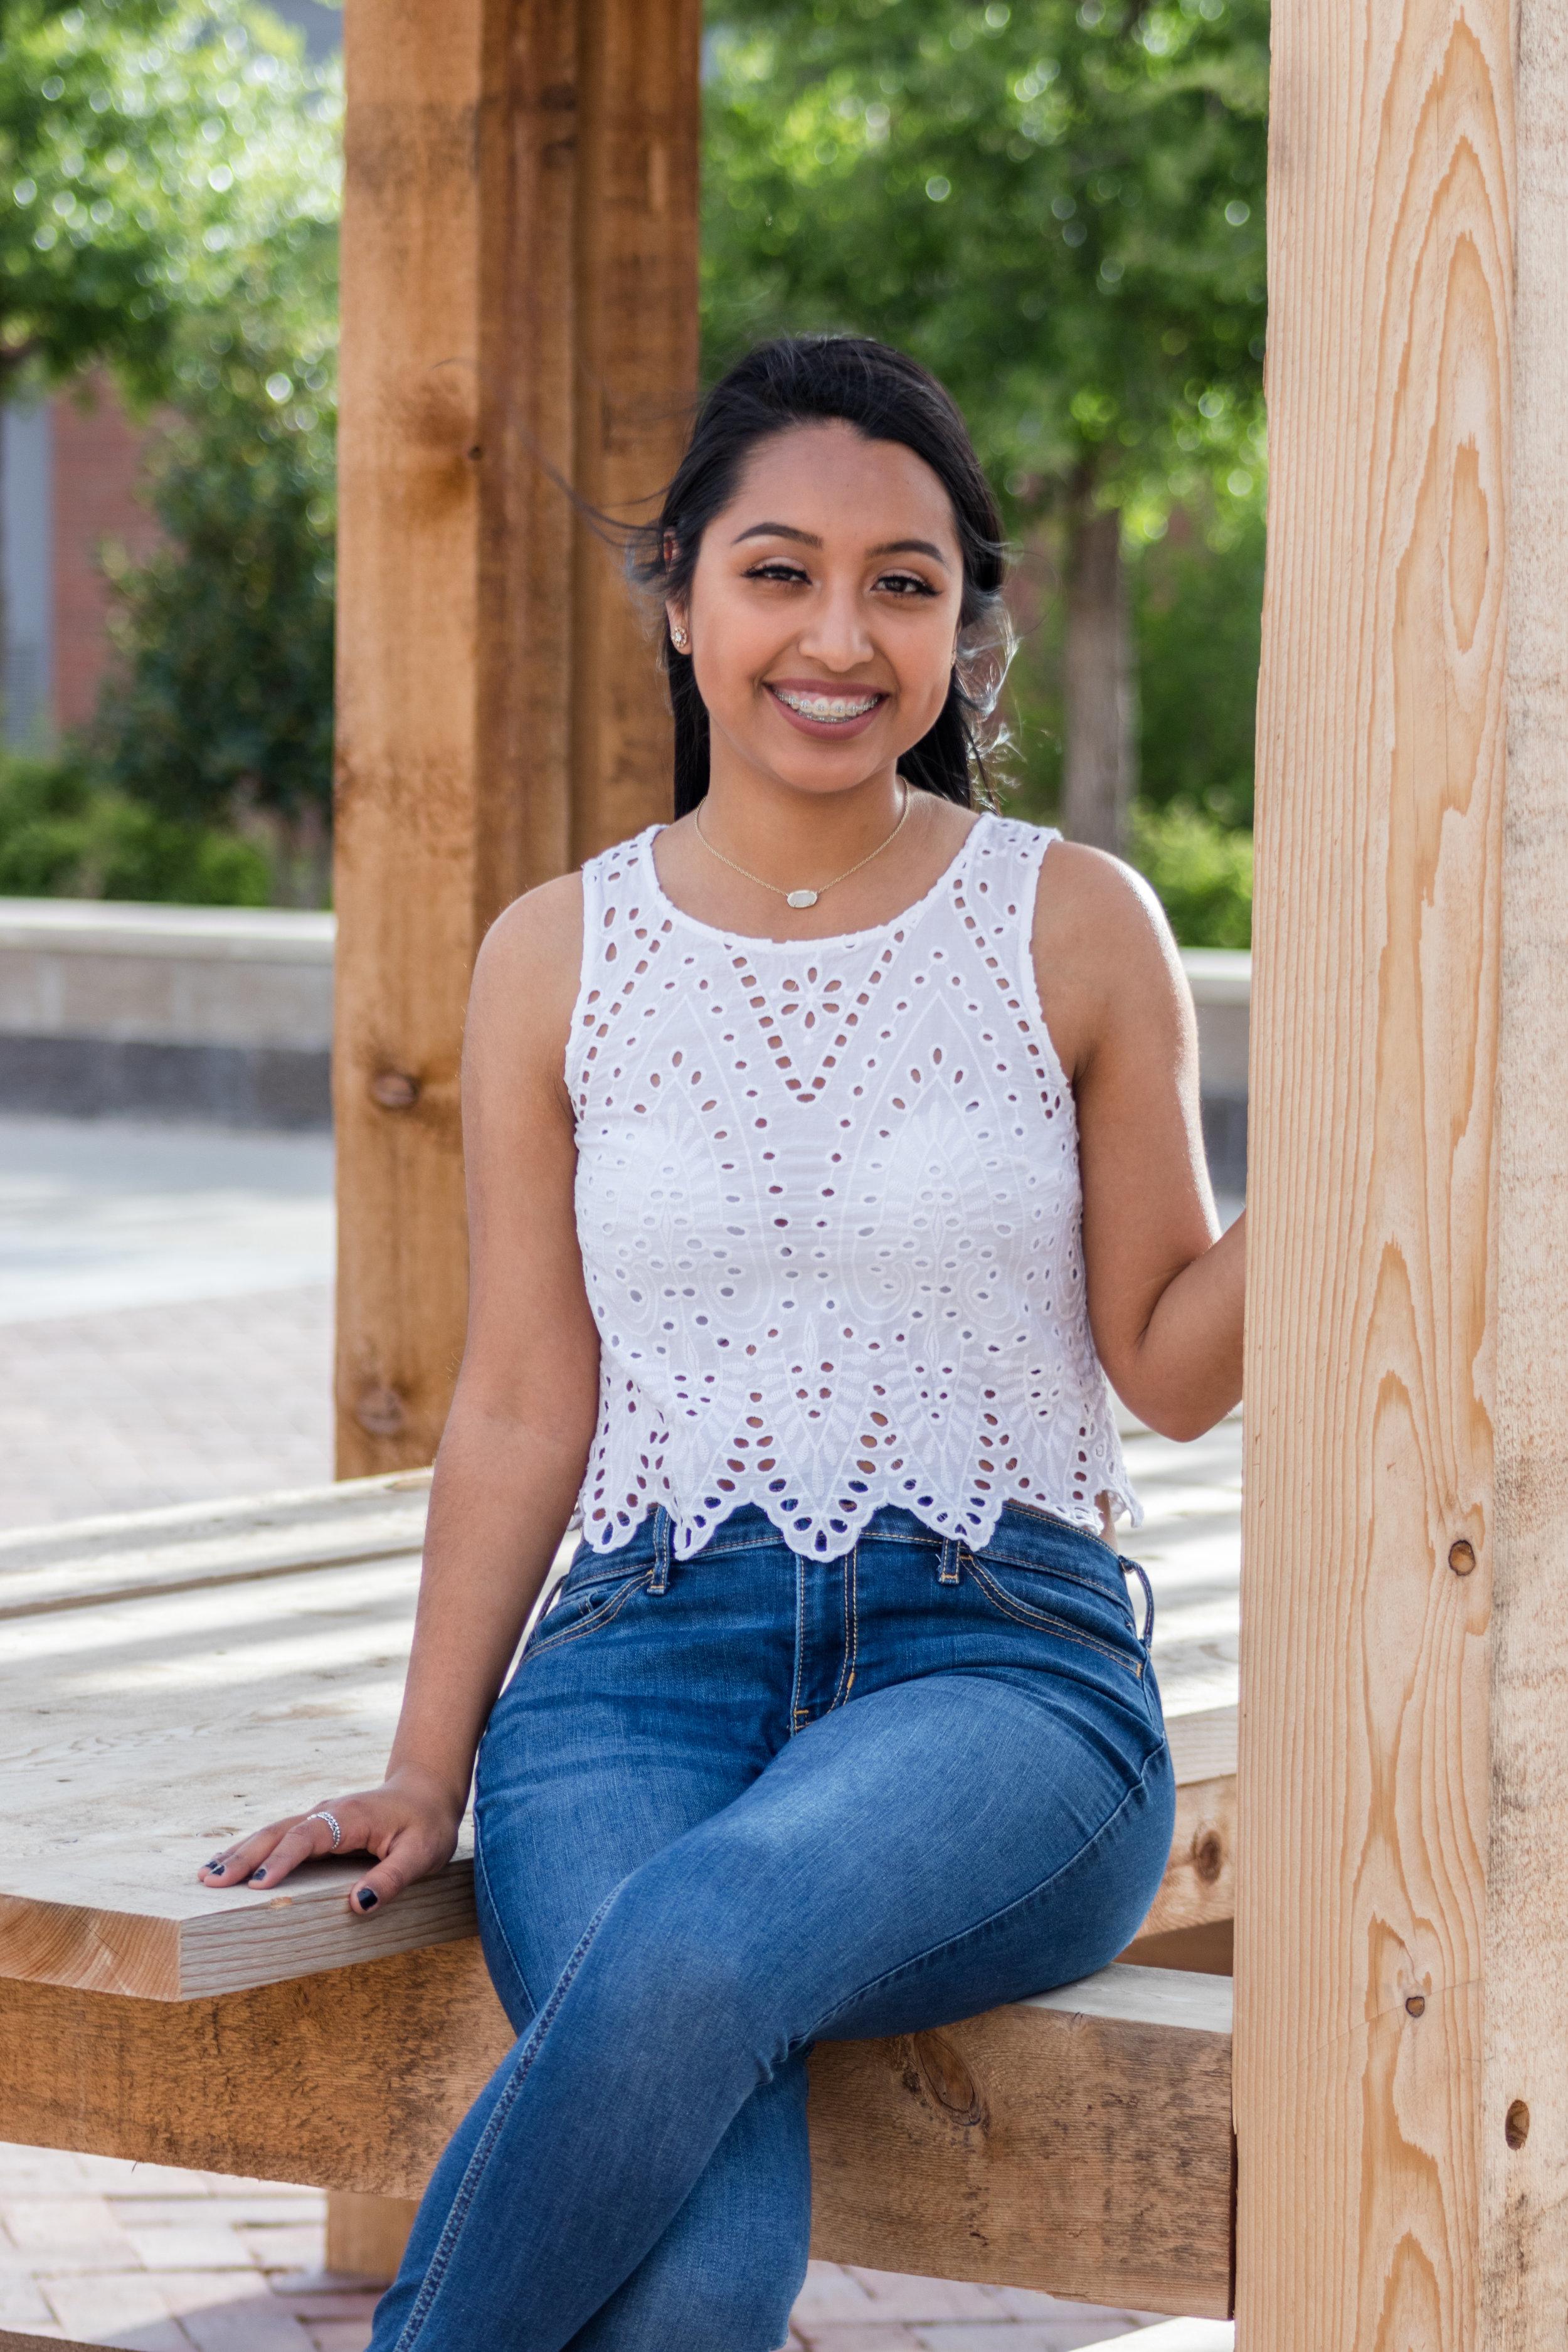 #48 Isabel *Aiyana* Cayetano - VP of Program Development   Fall 2017 - Zeta Line  Nationality: Mexican  Major: Biology